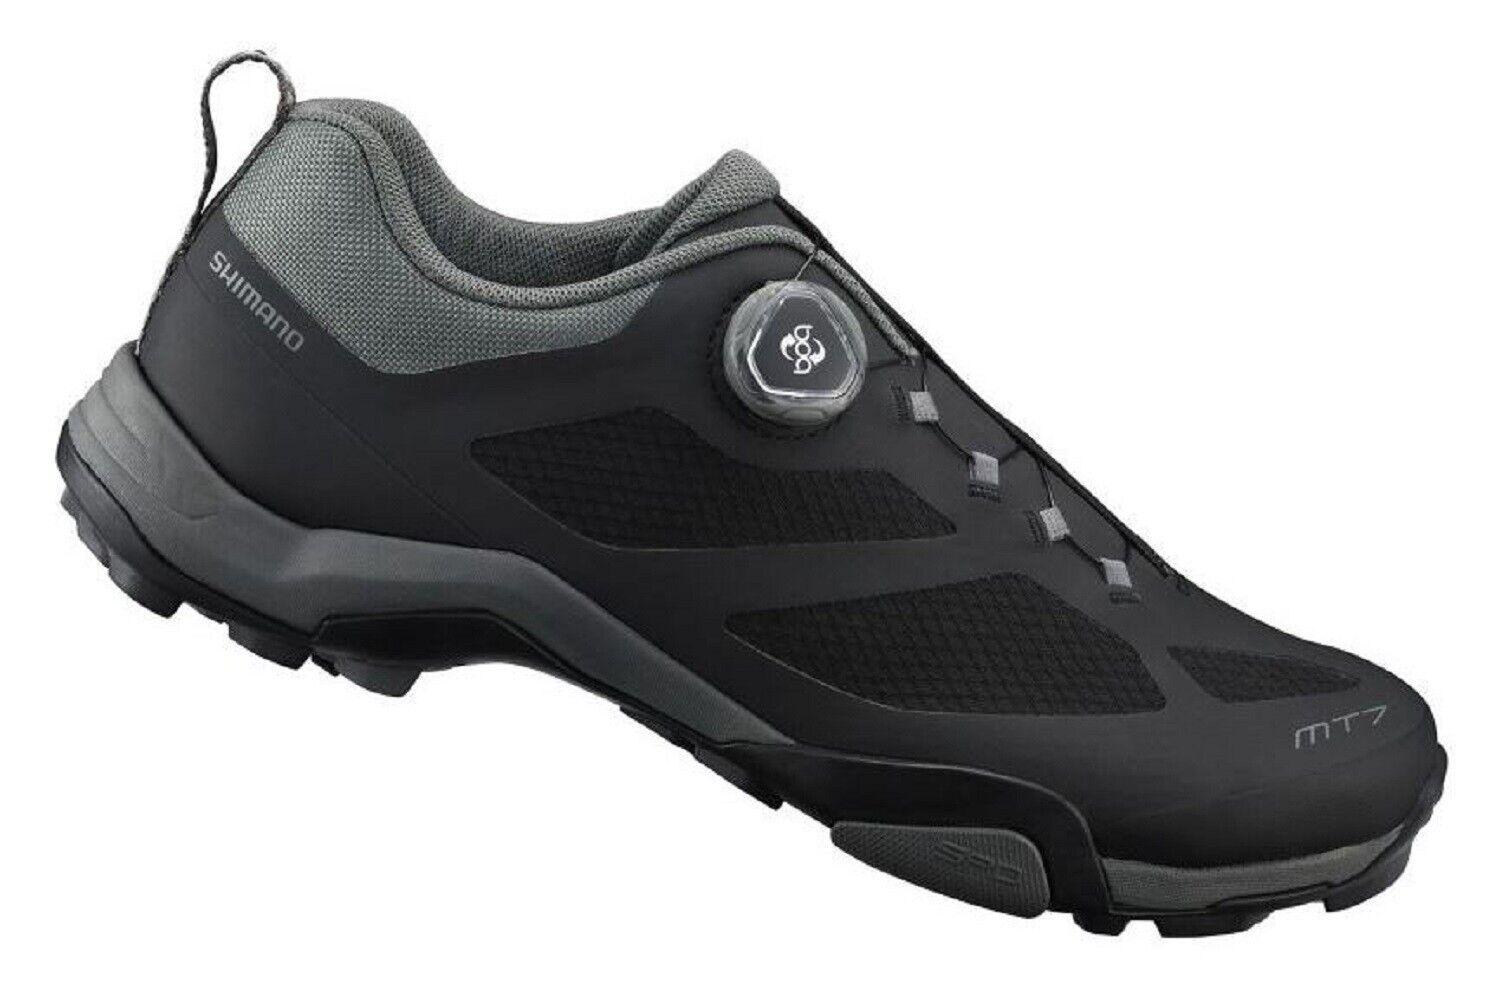 Bicicleta Shimano zapatos sh-mt7, Mountain Touring, negro, talla 44, boa ® cierre